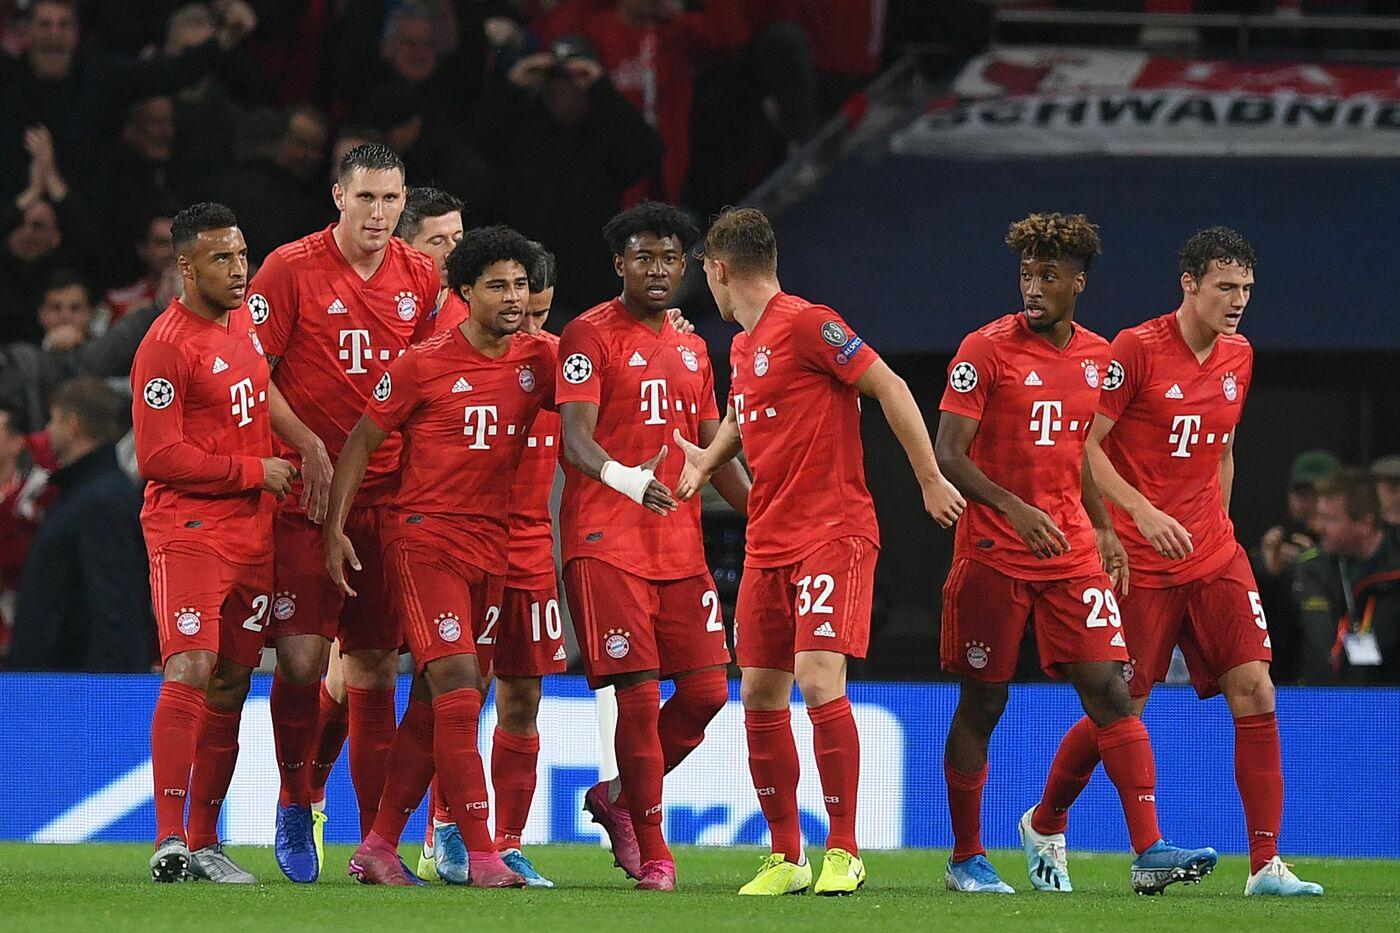 Bayern Monaco-Union Berlino 26 ottobre pronostico Bundesliga